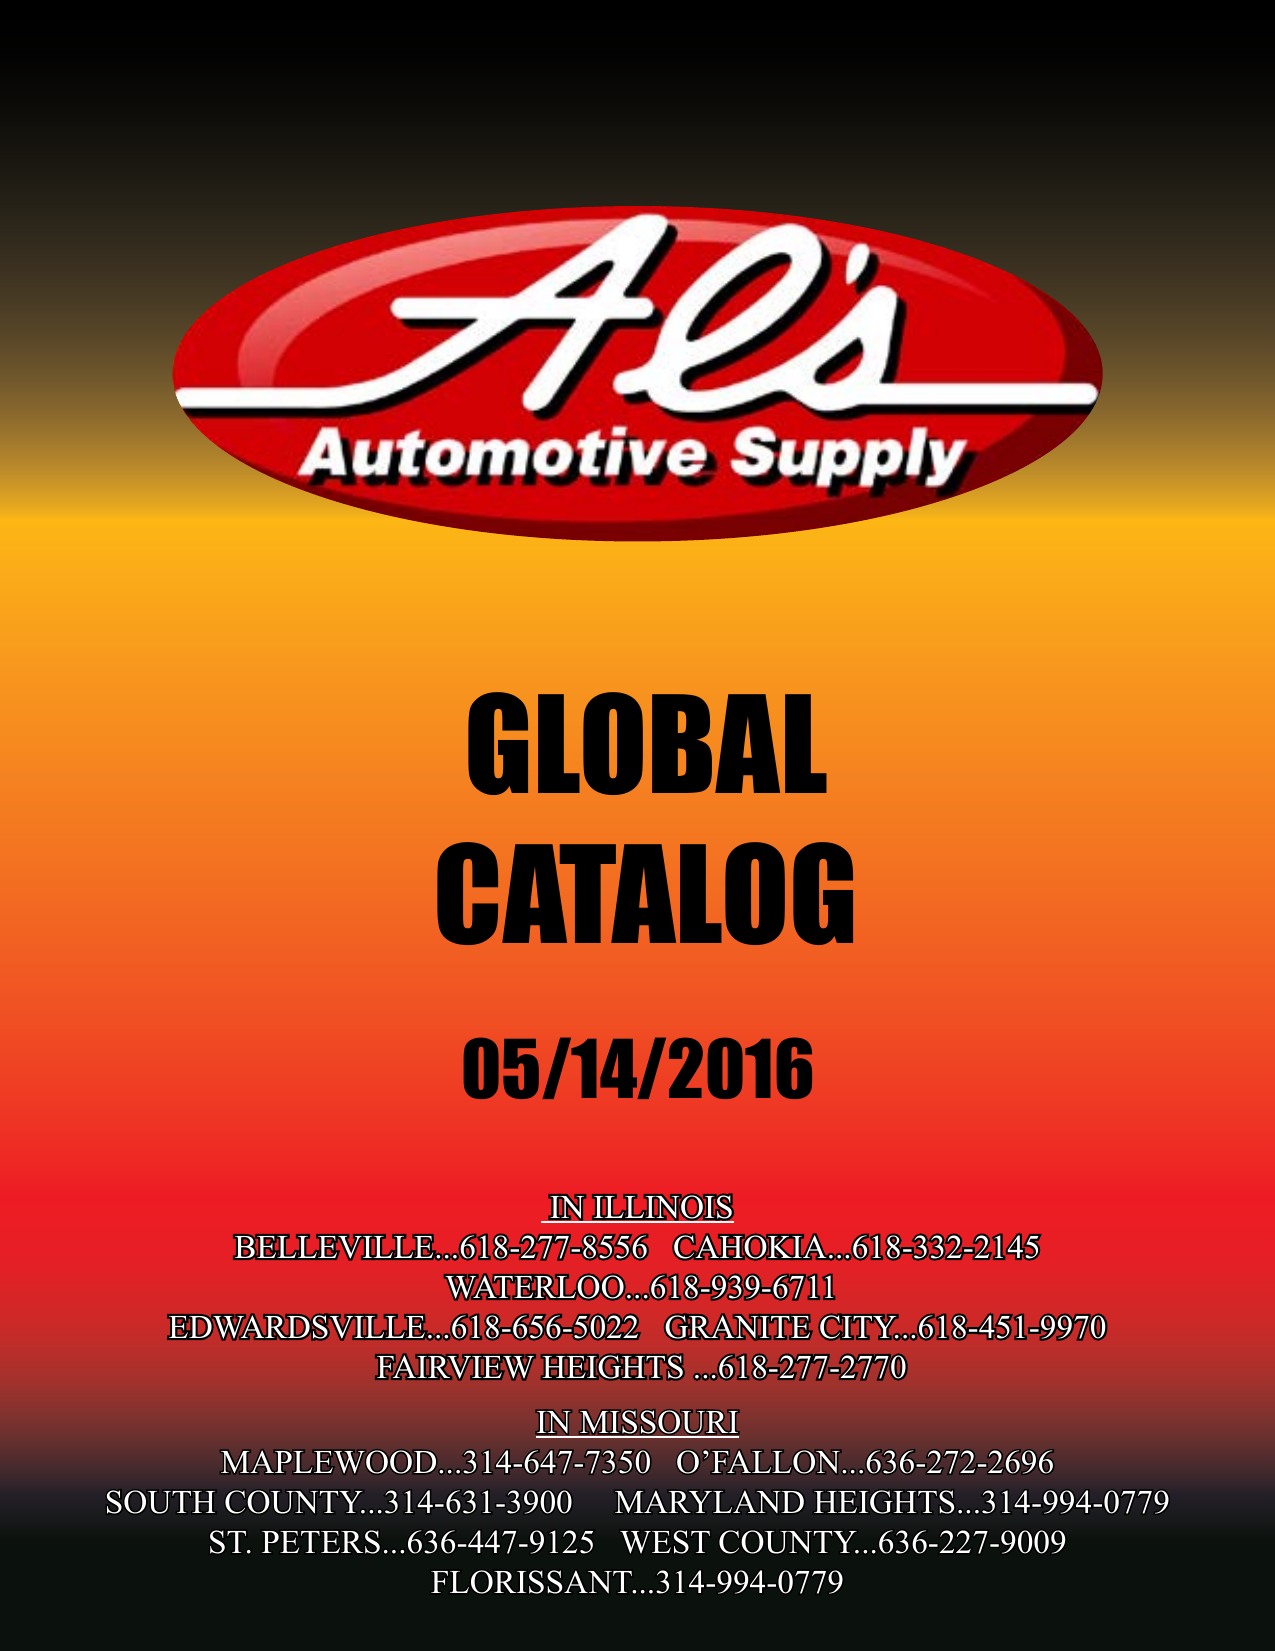 Global Catalog Als Automotive Supply Xl Data Hodrod Rp 50000